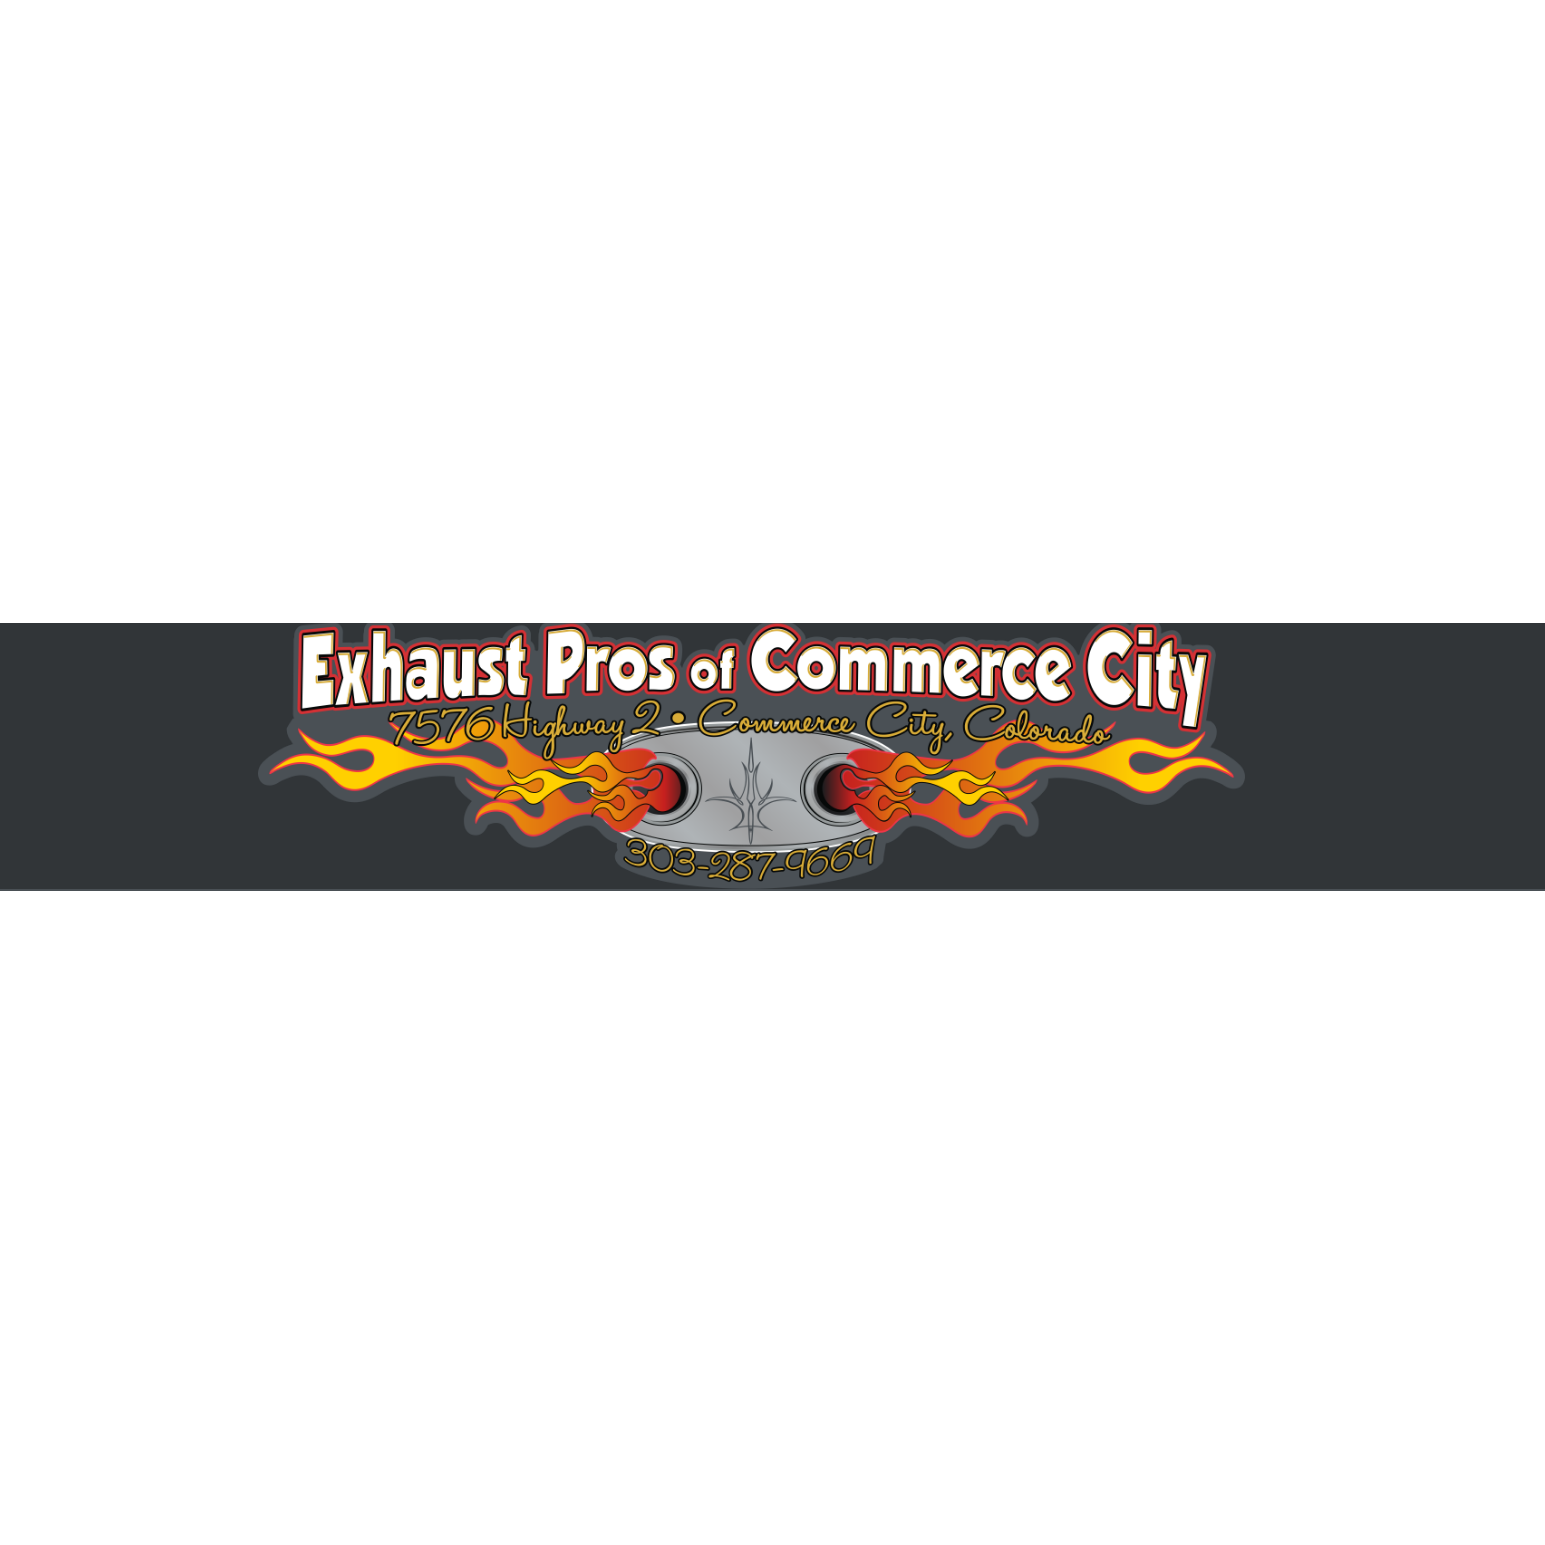 Exhaust Pros of Commerce City